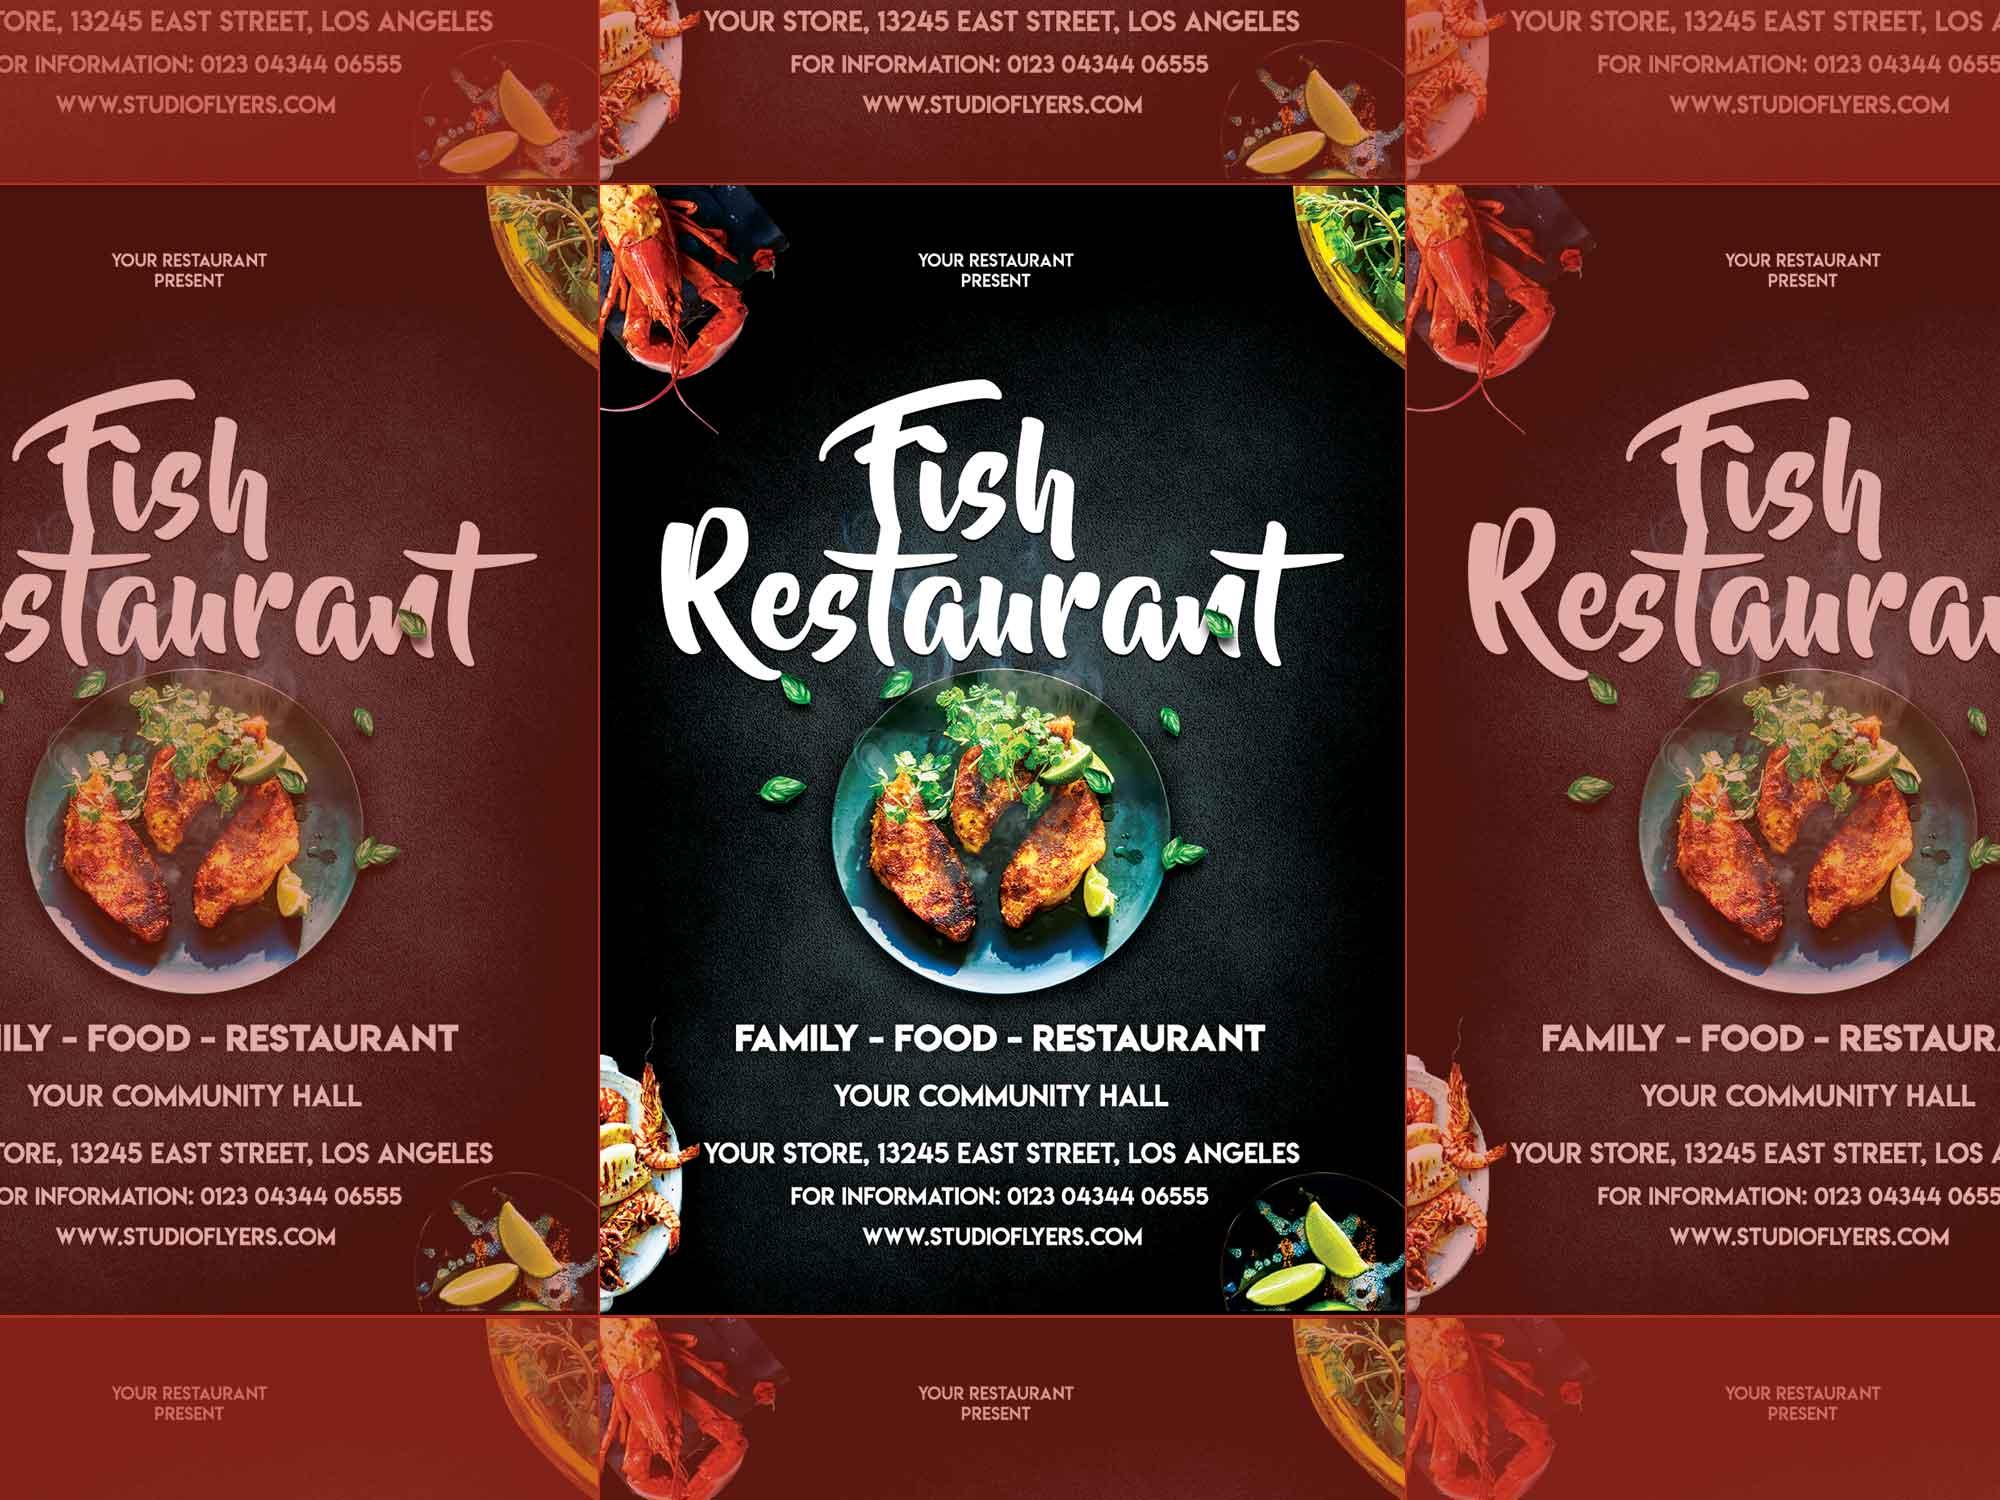 Fish Restaurant Flyer Template 2